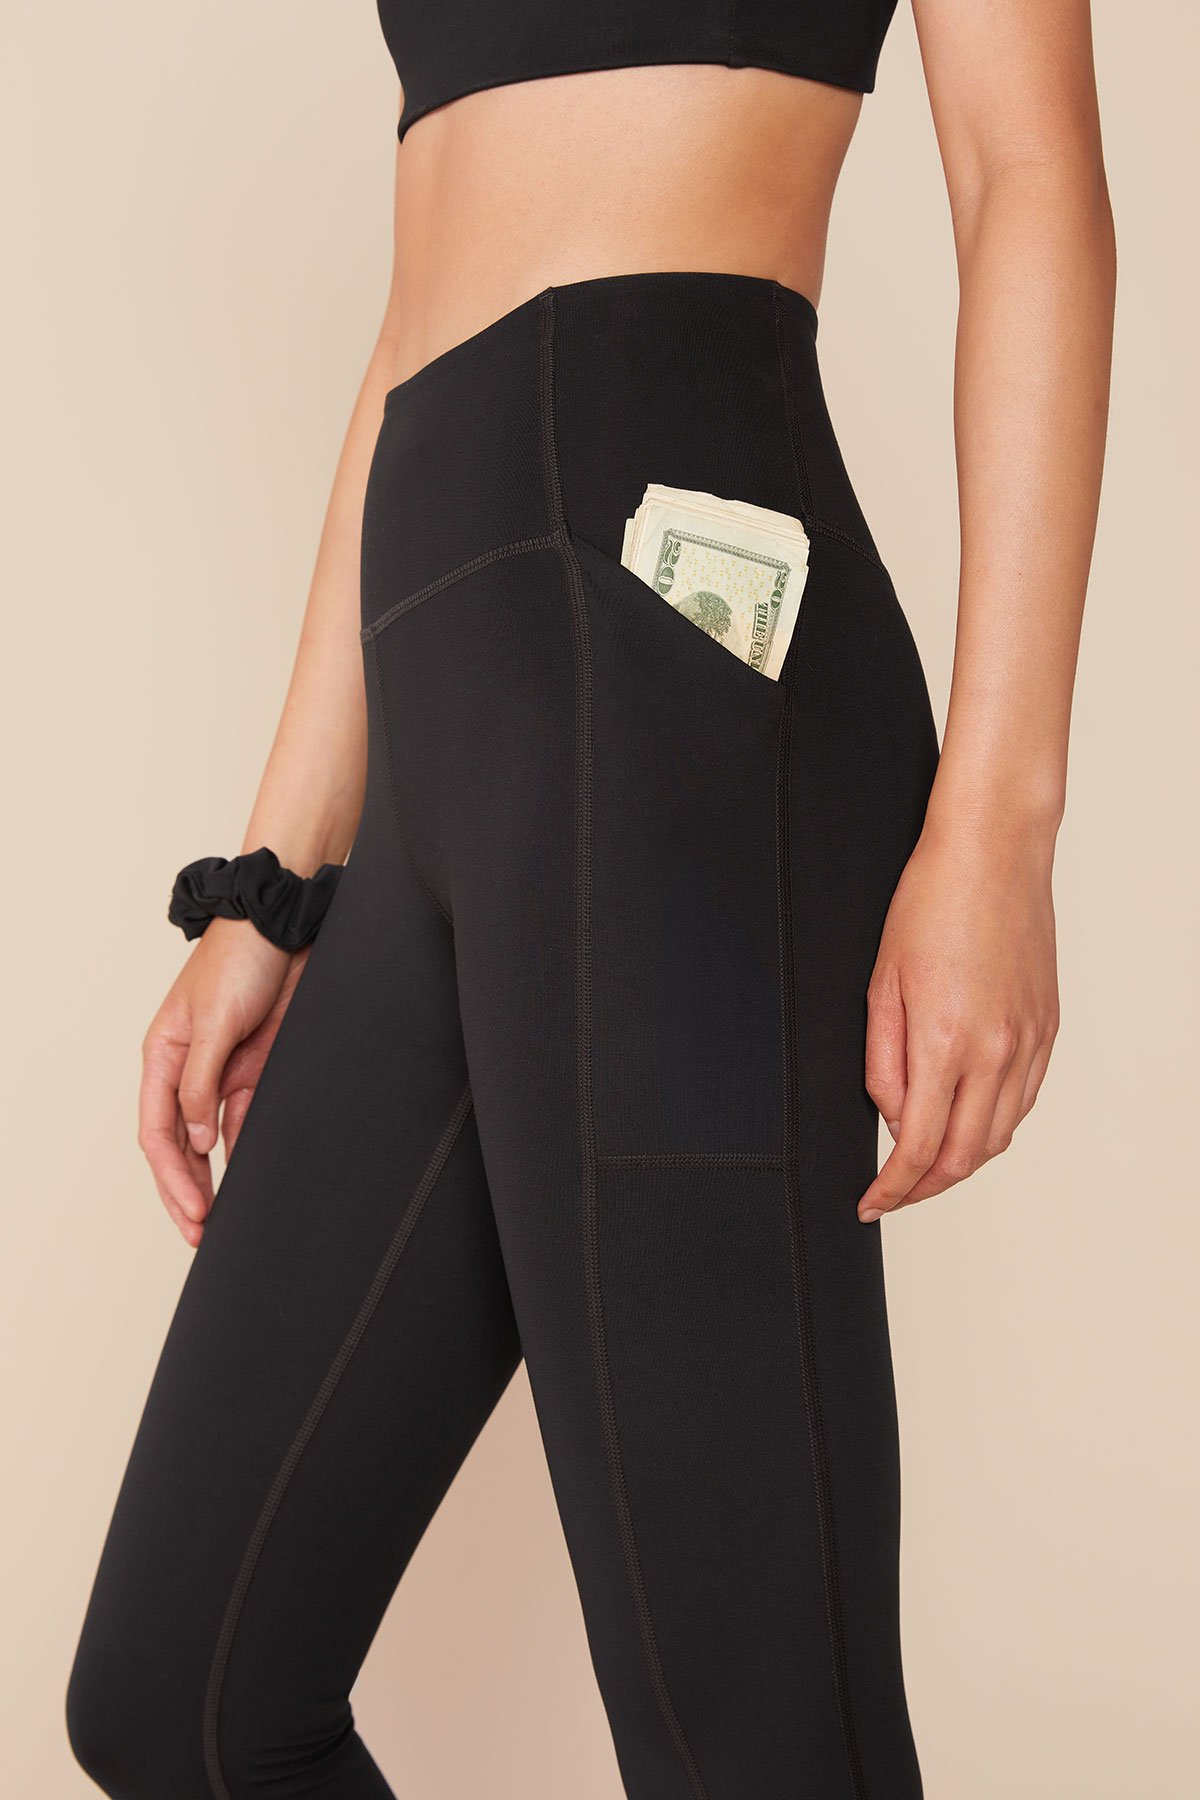 Black High-Rise Pocket Legging $78